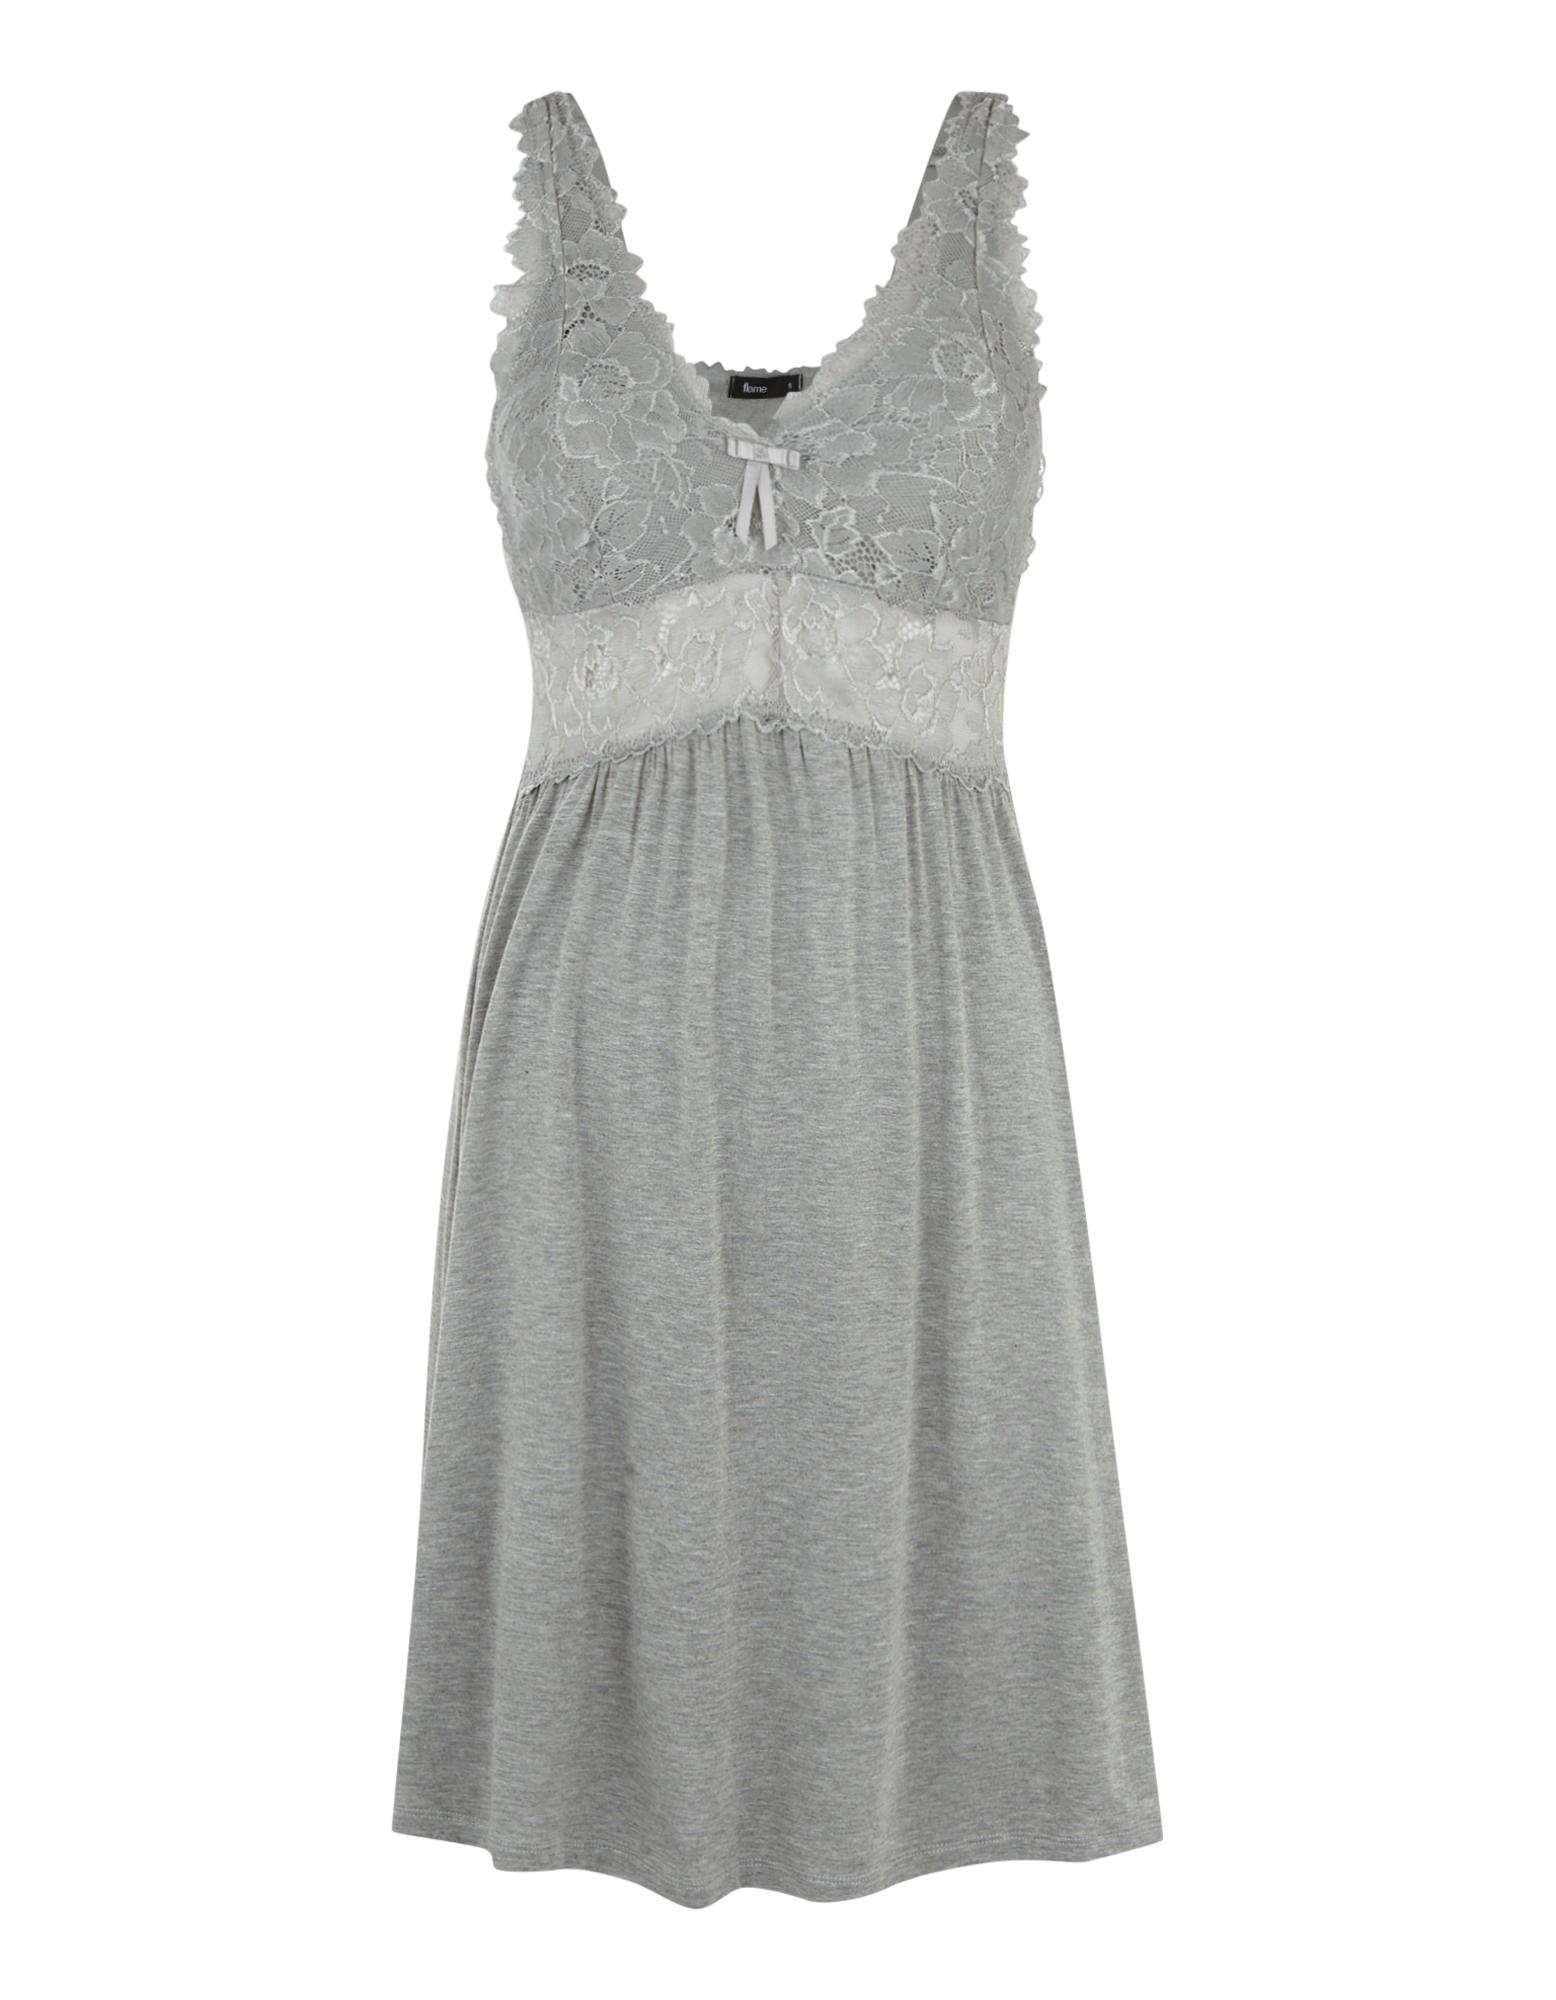 a10a0bbfee2aa9 Damen Nachthemd mit Spitzenbesatz - Takko Fashion